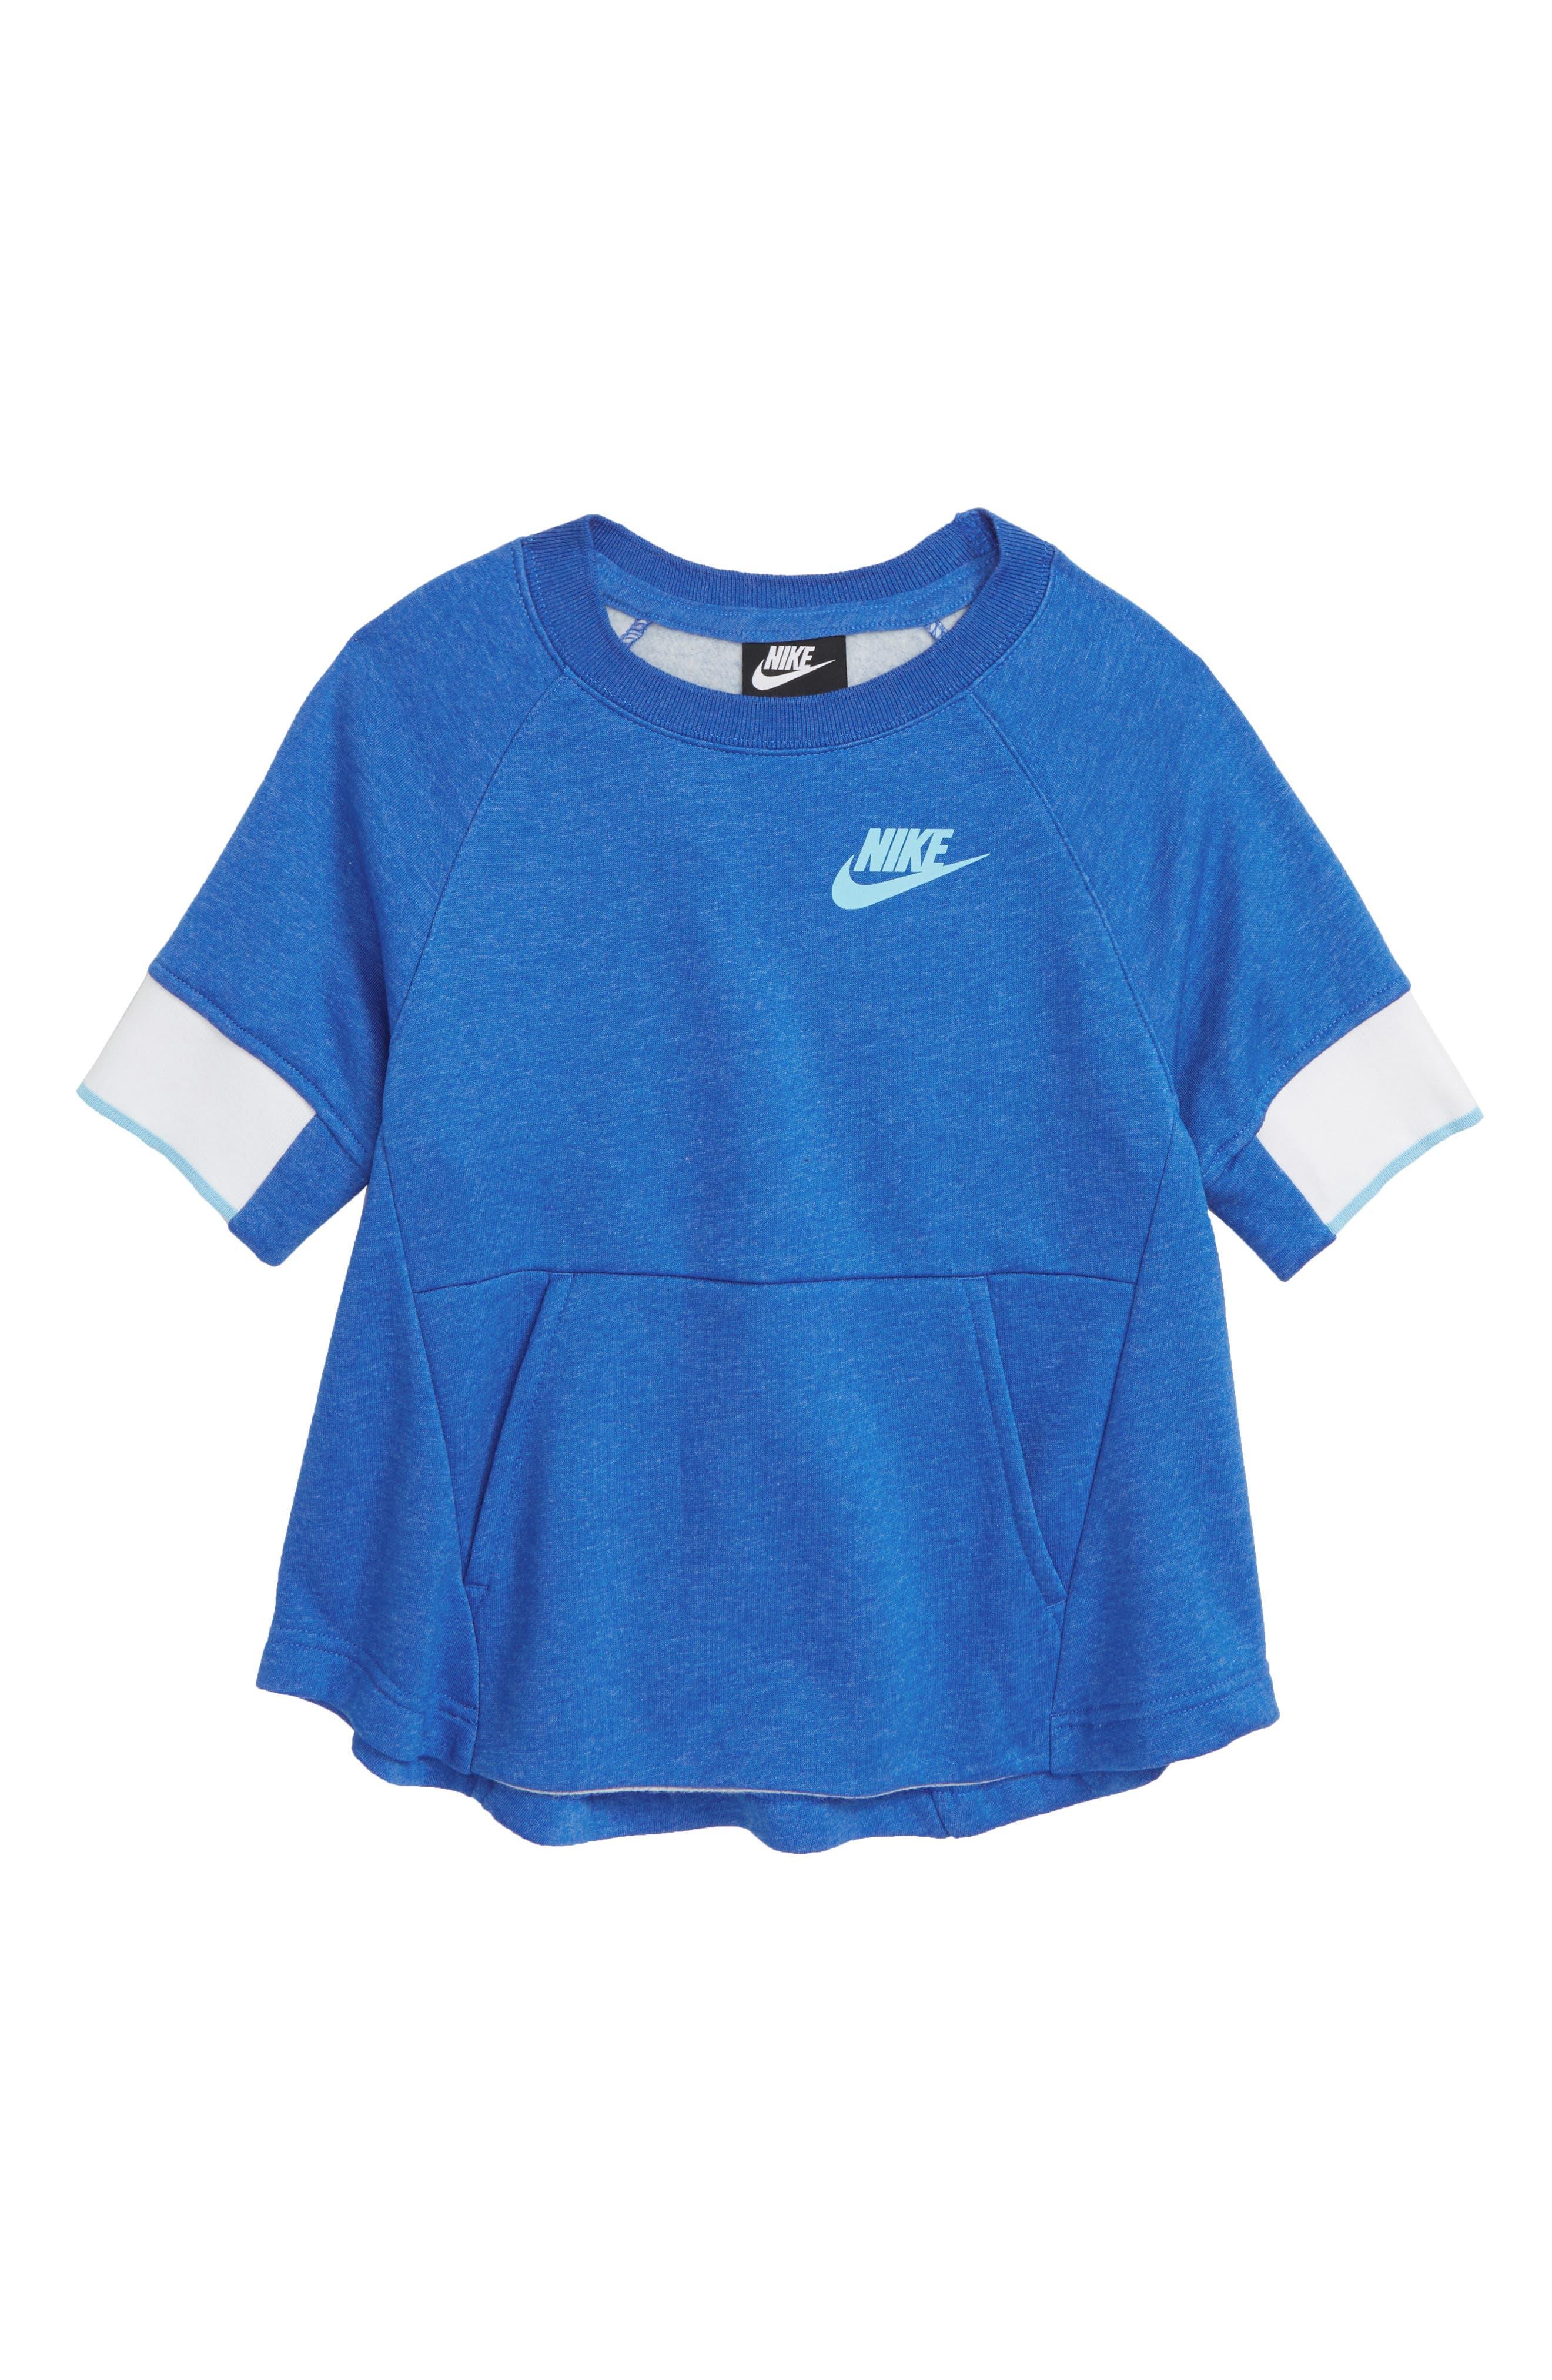 Sportswear Crewneck Pullover,                             Main thumbnail 1, color,                             SIGNAL BLUE/ HTR/ BLUE CHILL